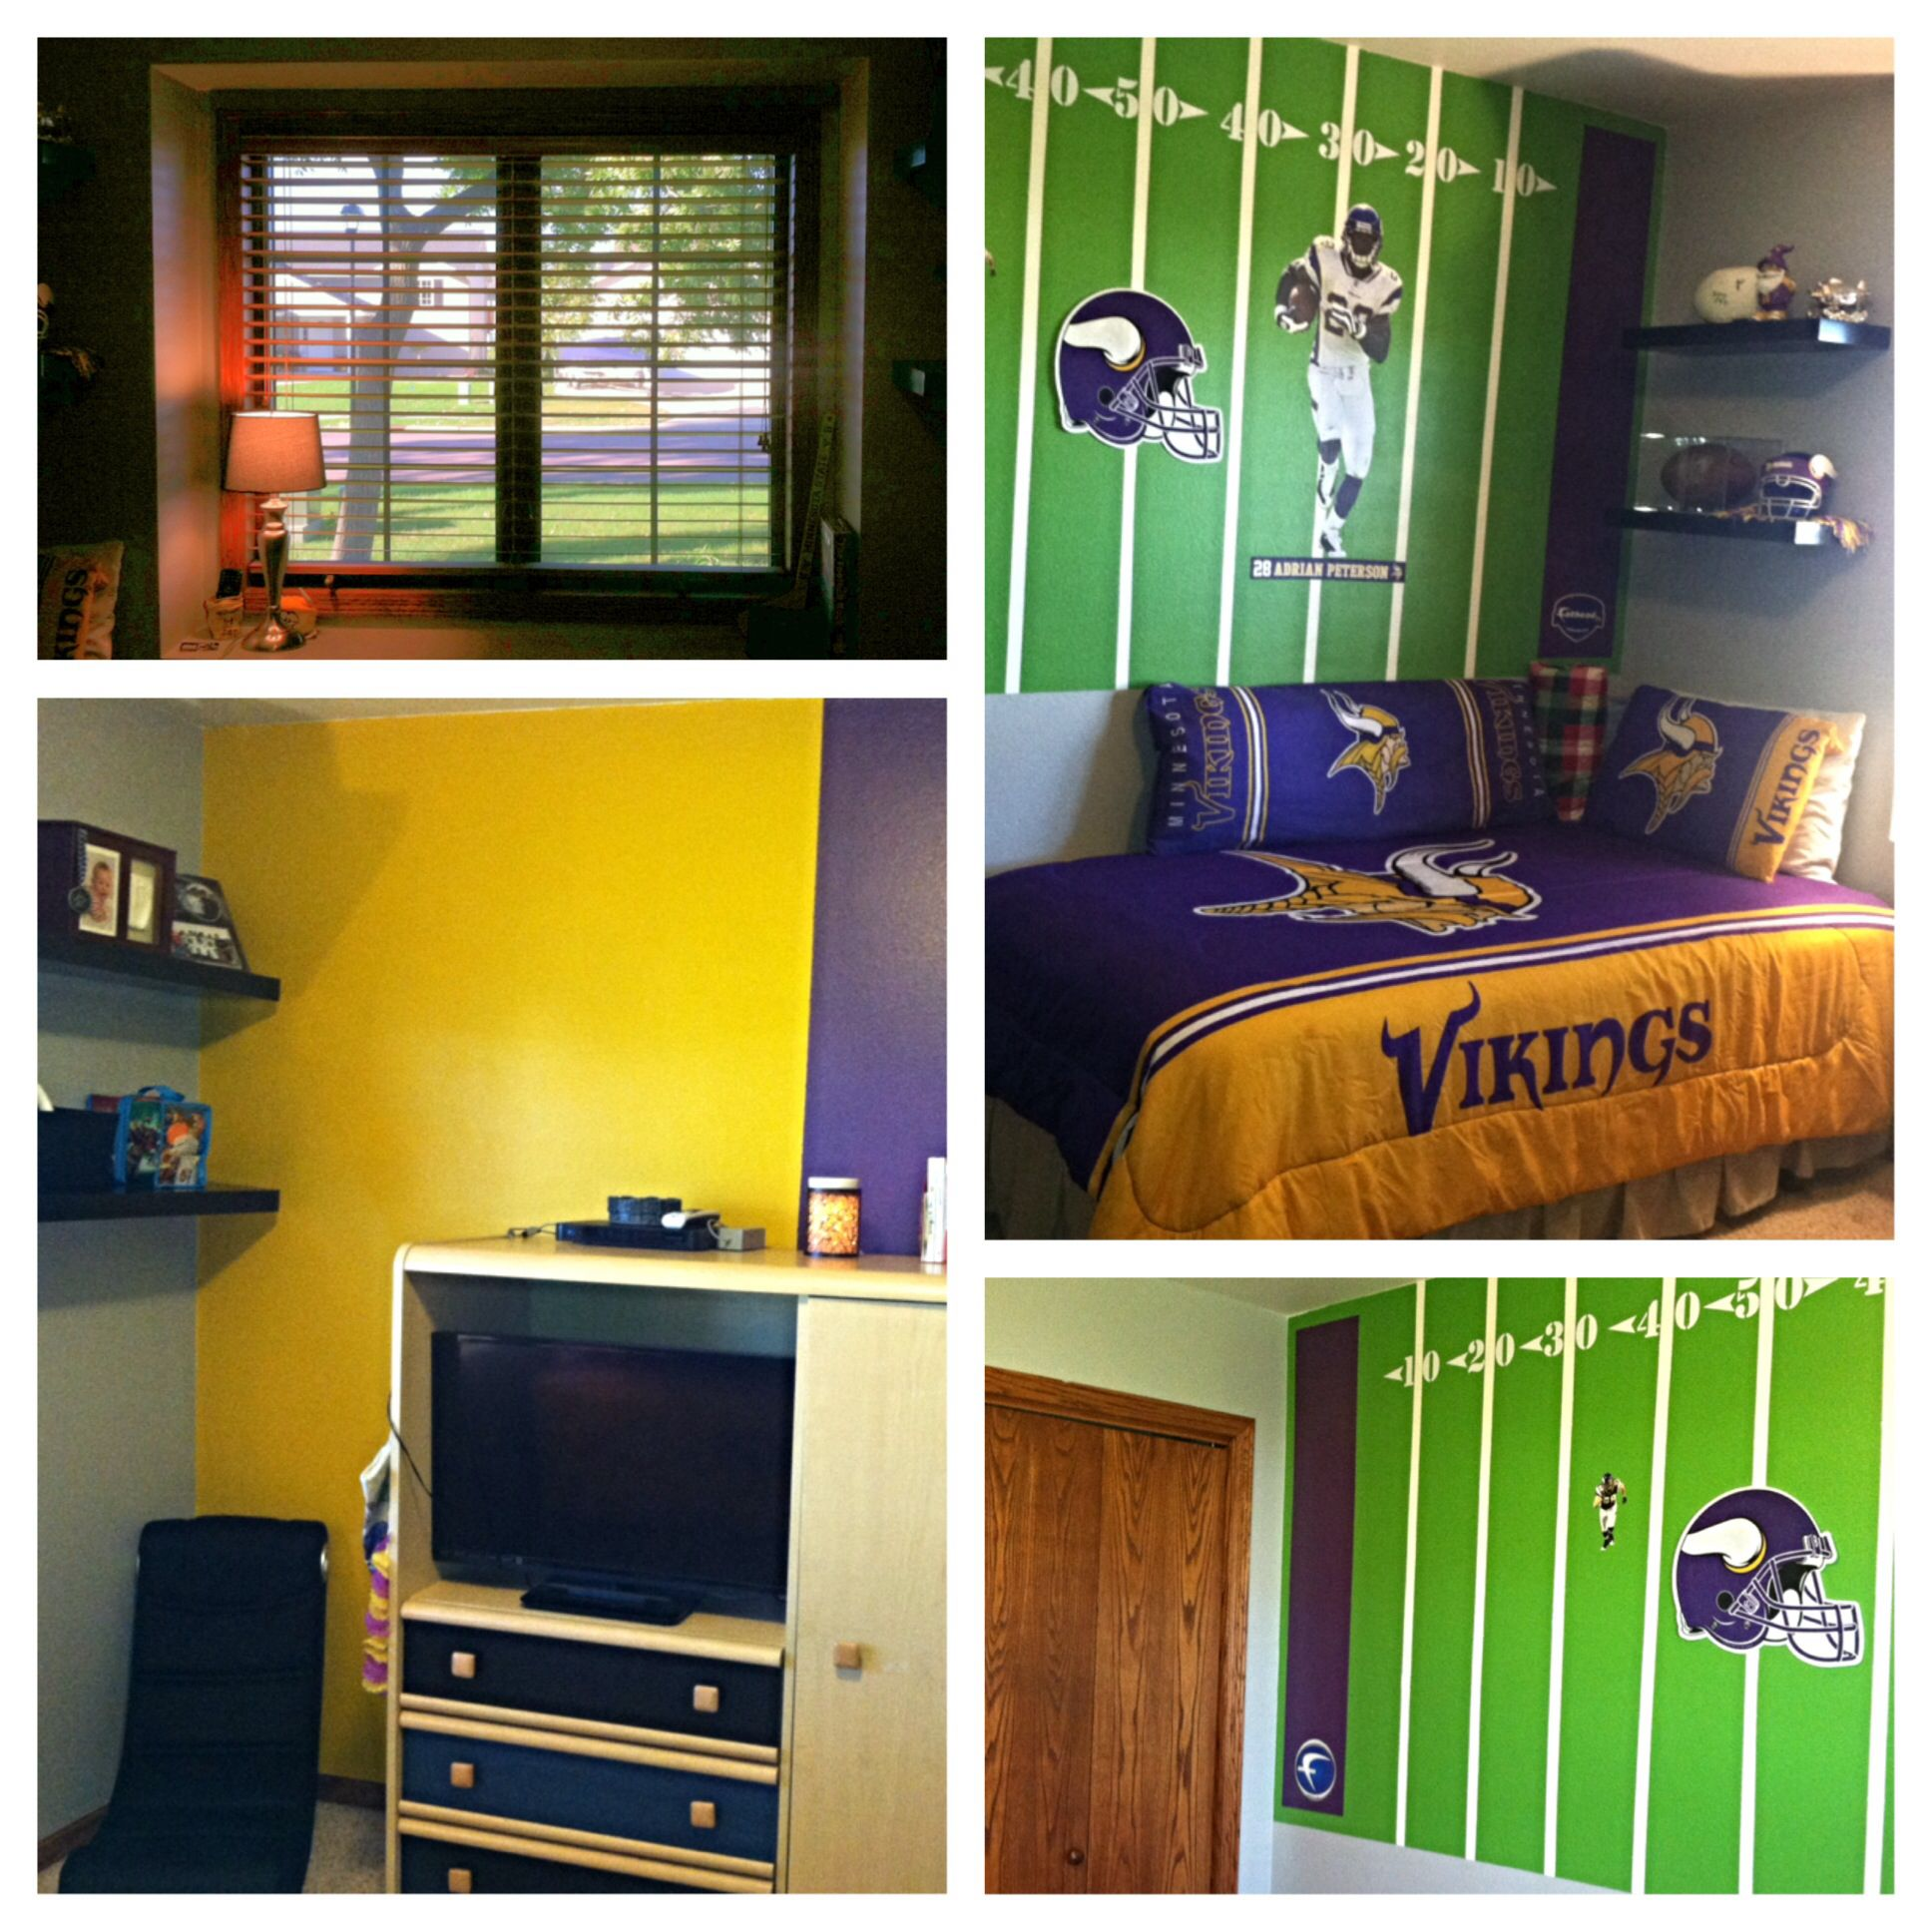 Childrens Football Bedroom Ideas: Minnesota Vikings Bedroom For My 9 Year Old Son. Skol